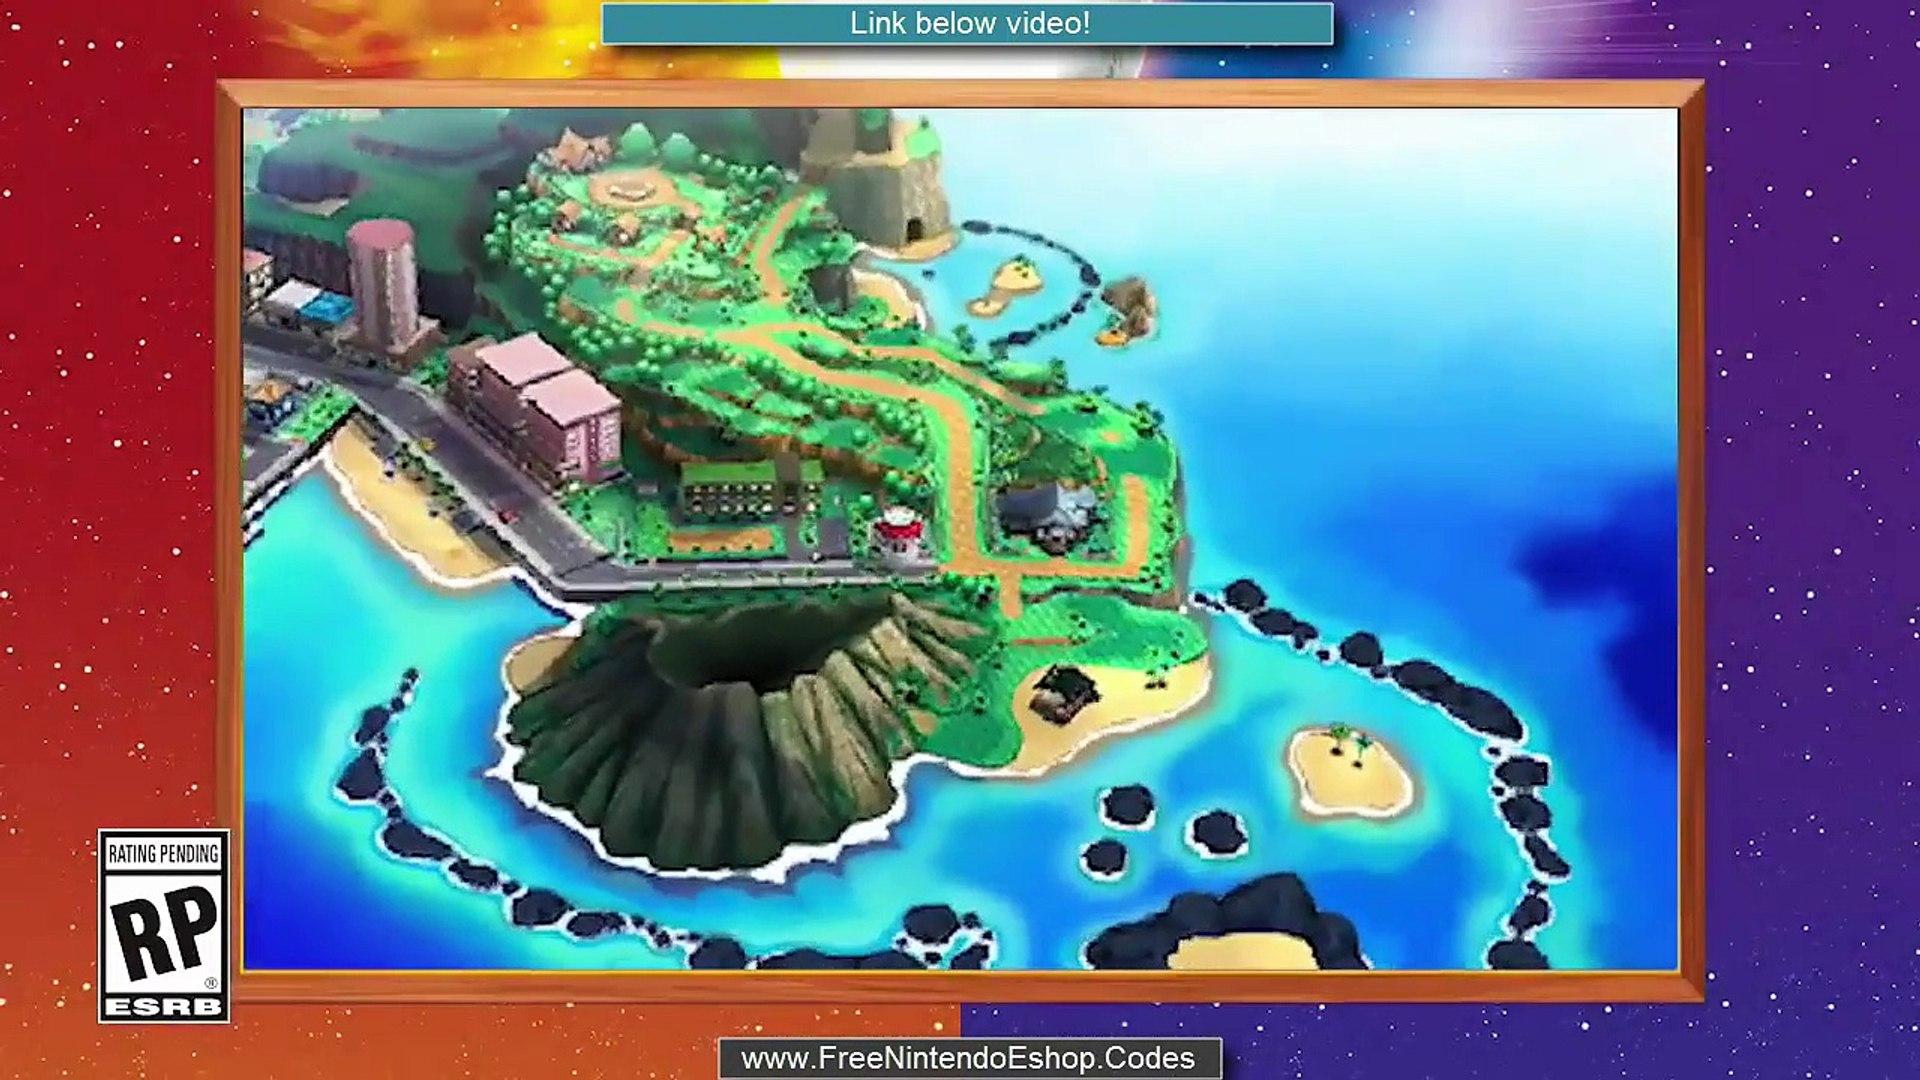 free pokemon sun download code - pokemon sun eshop code - pokemon sun and  moon redeem code